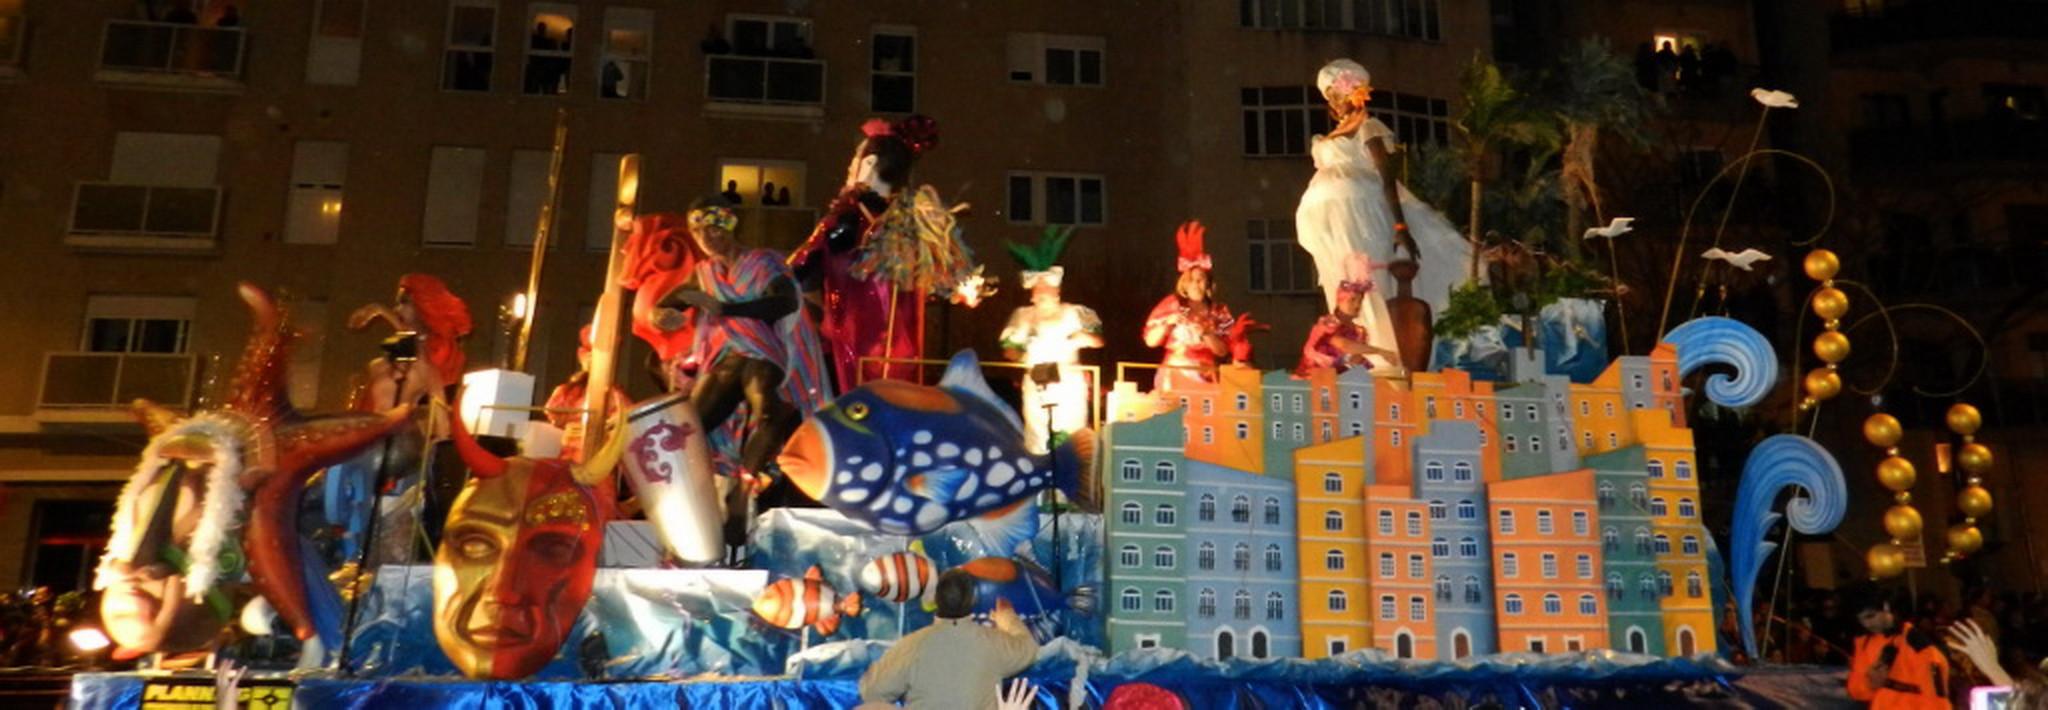 desfile carnaval febrero 2013 Cádiz